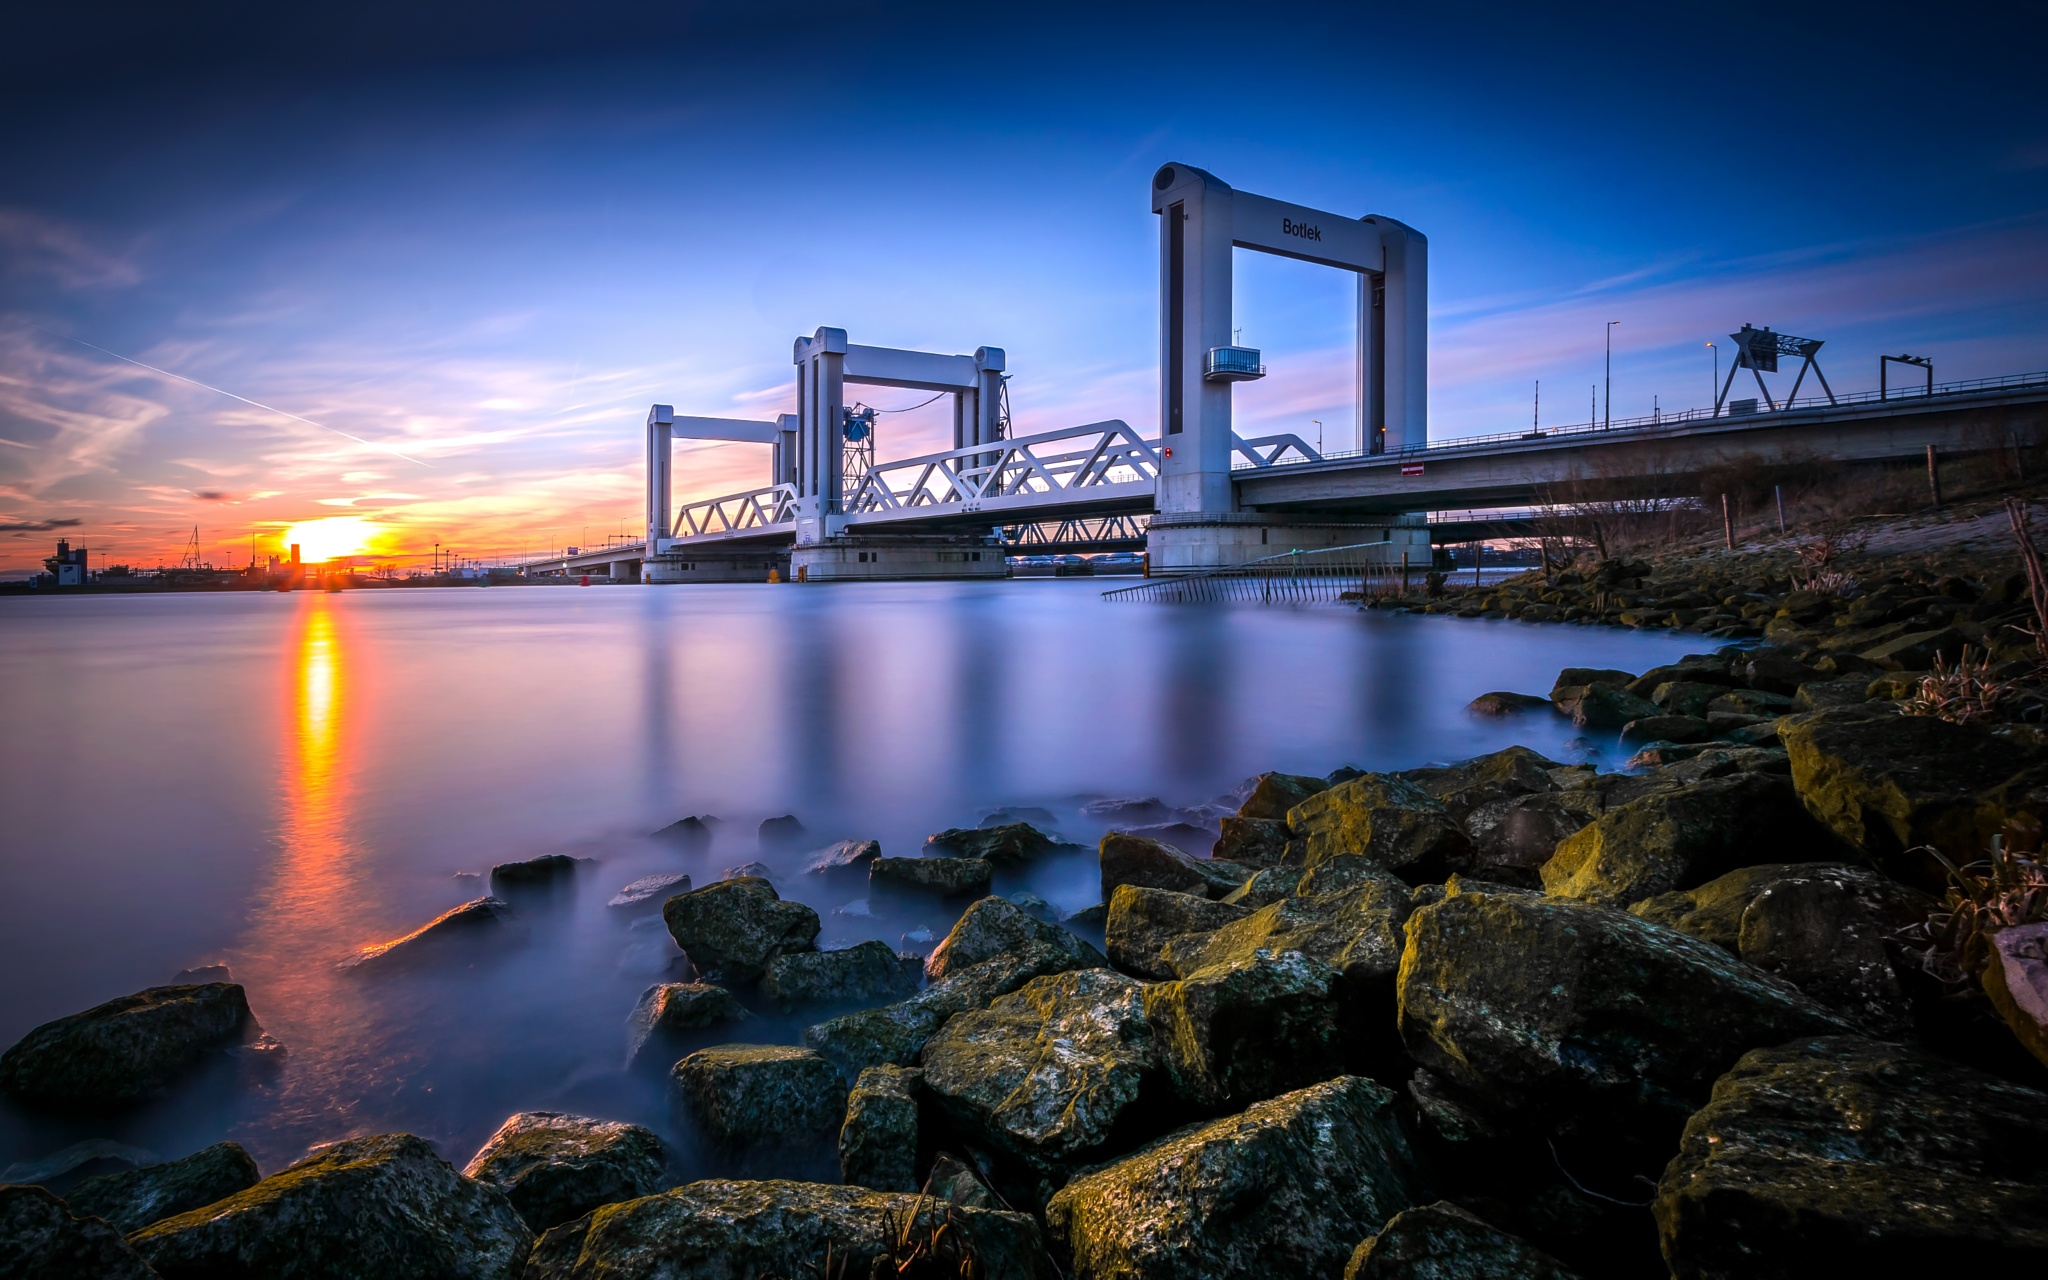 'Botlek' bridge at sunset. by Niels Dam